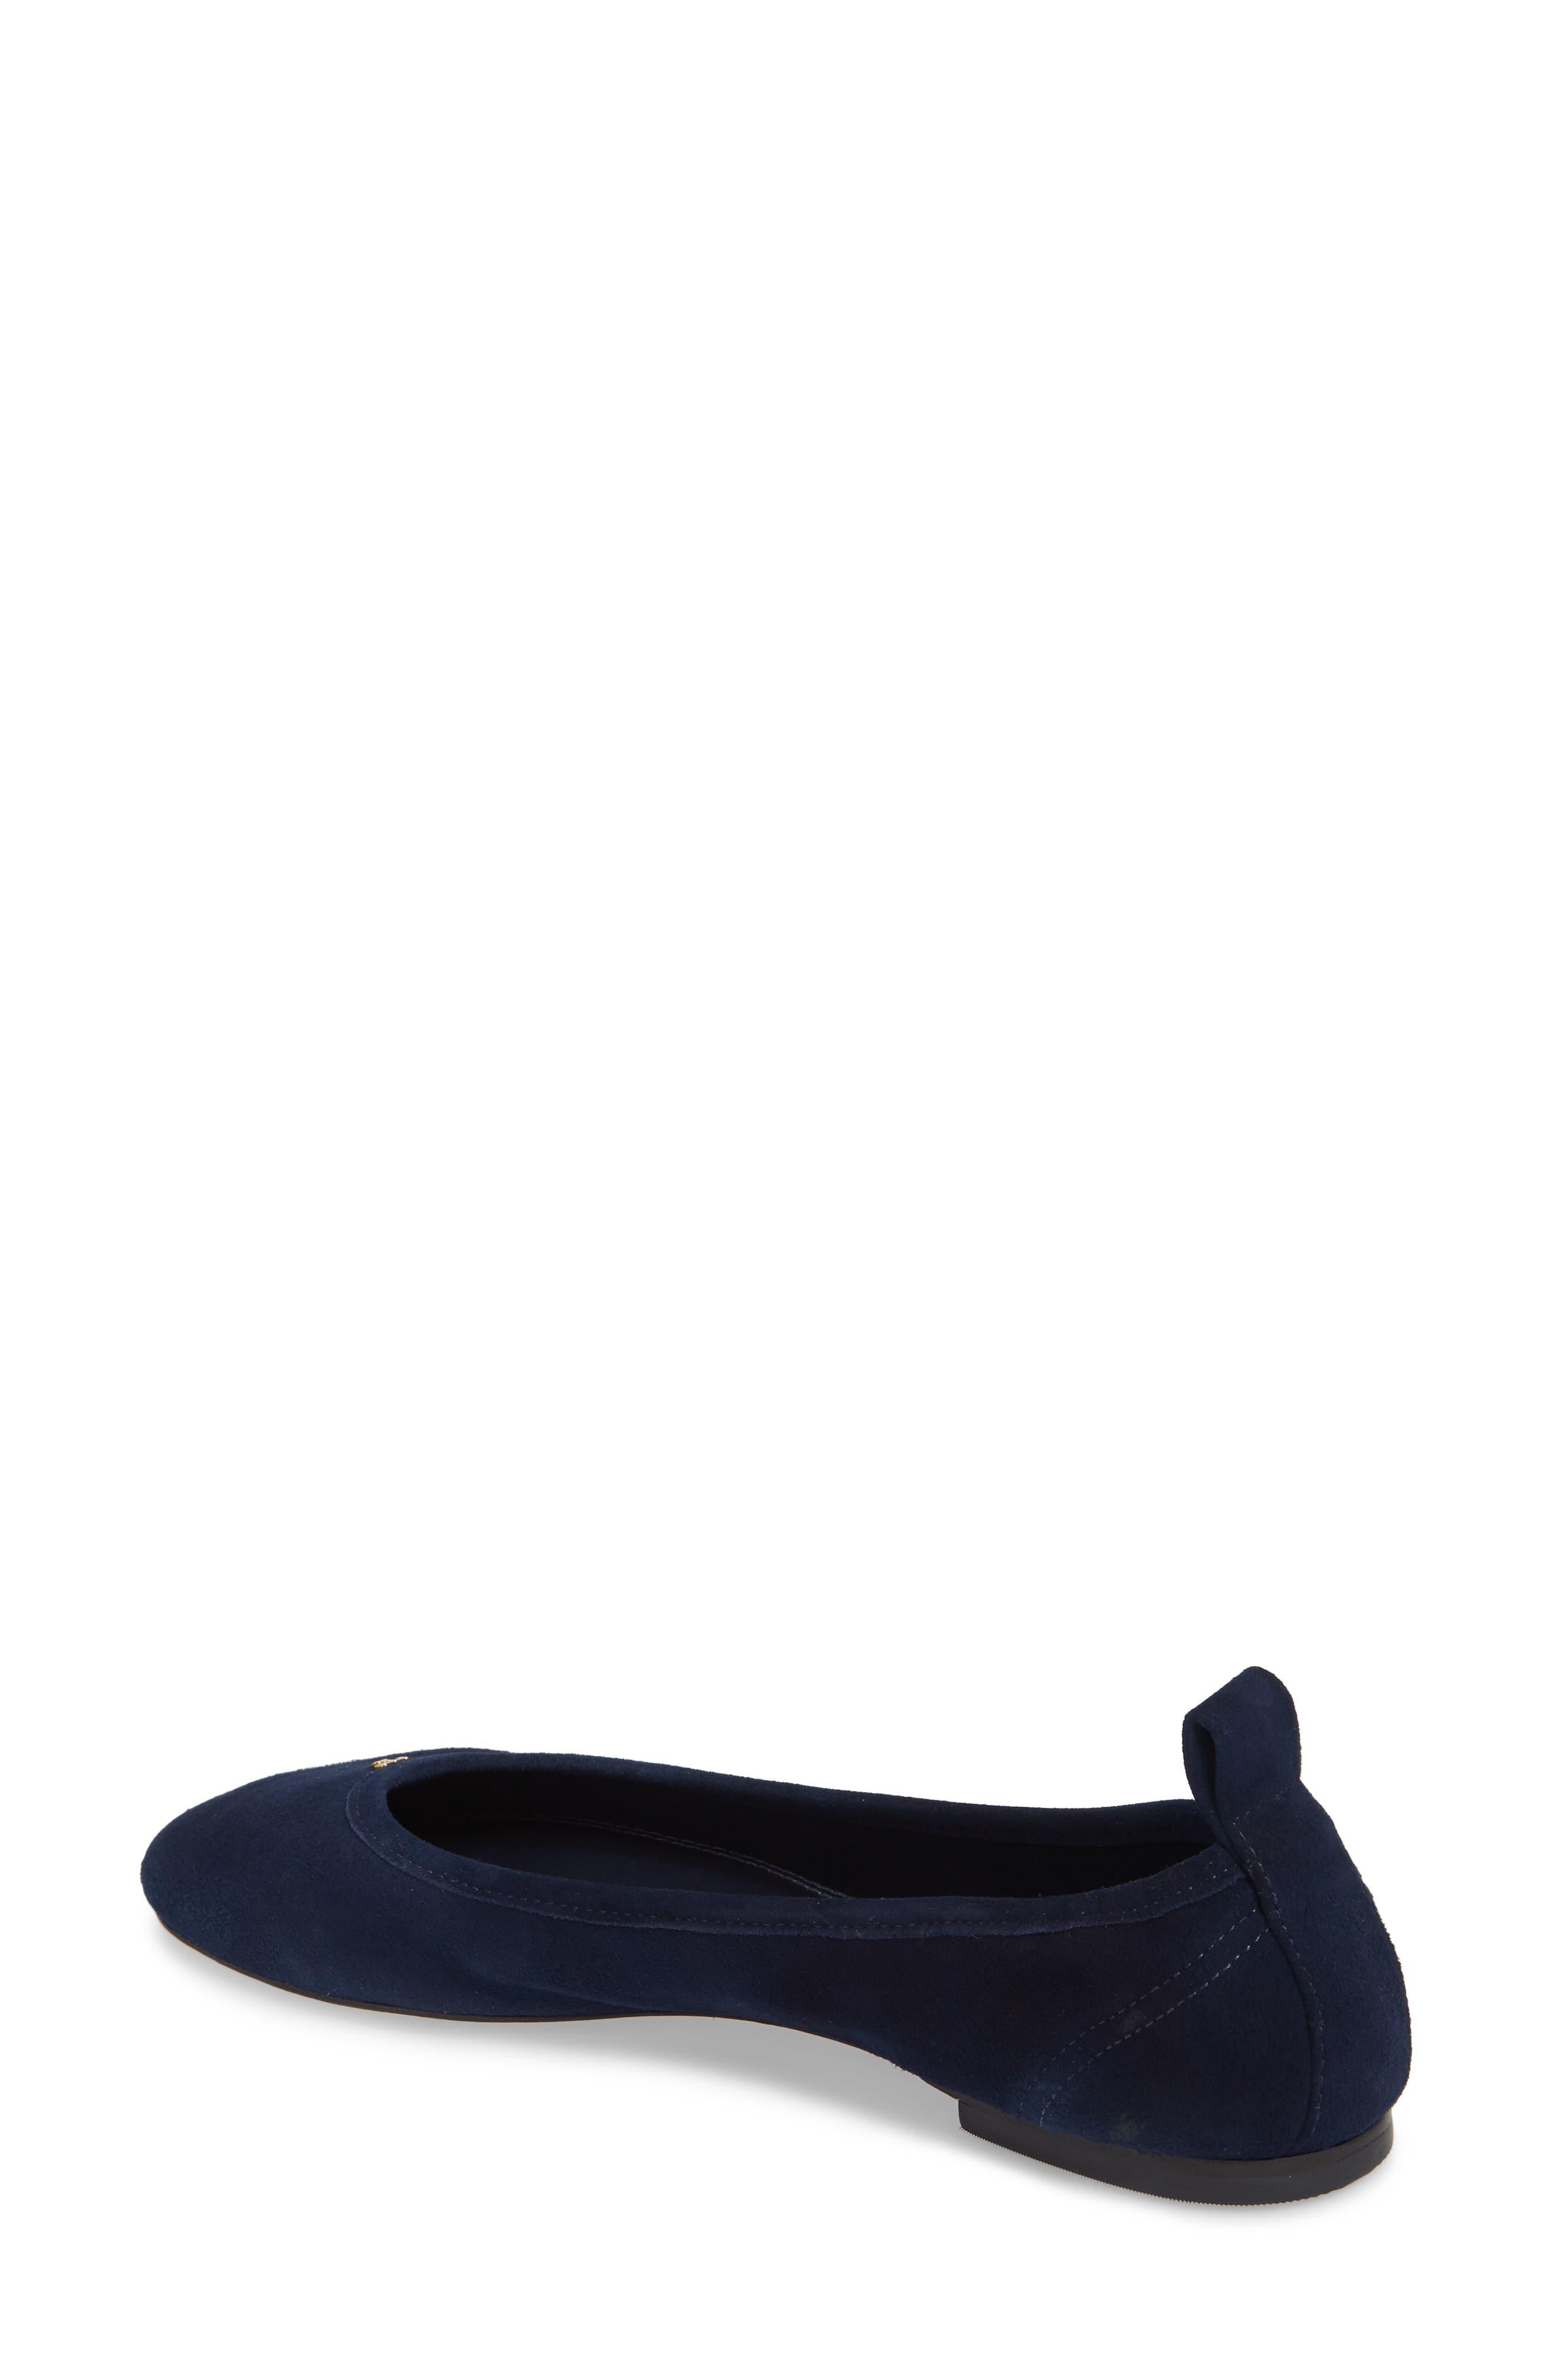 Therese Ballet Flat,                             Alternate thumbnail 2, color,                             Royal Navy